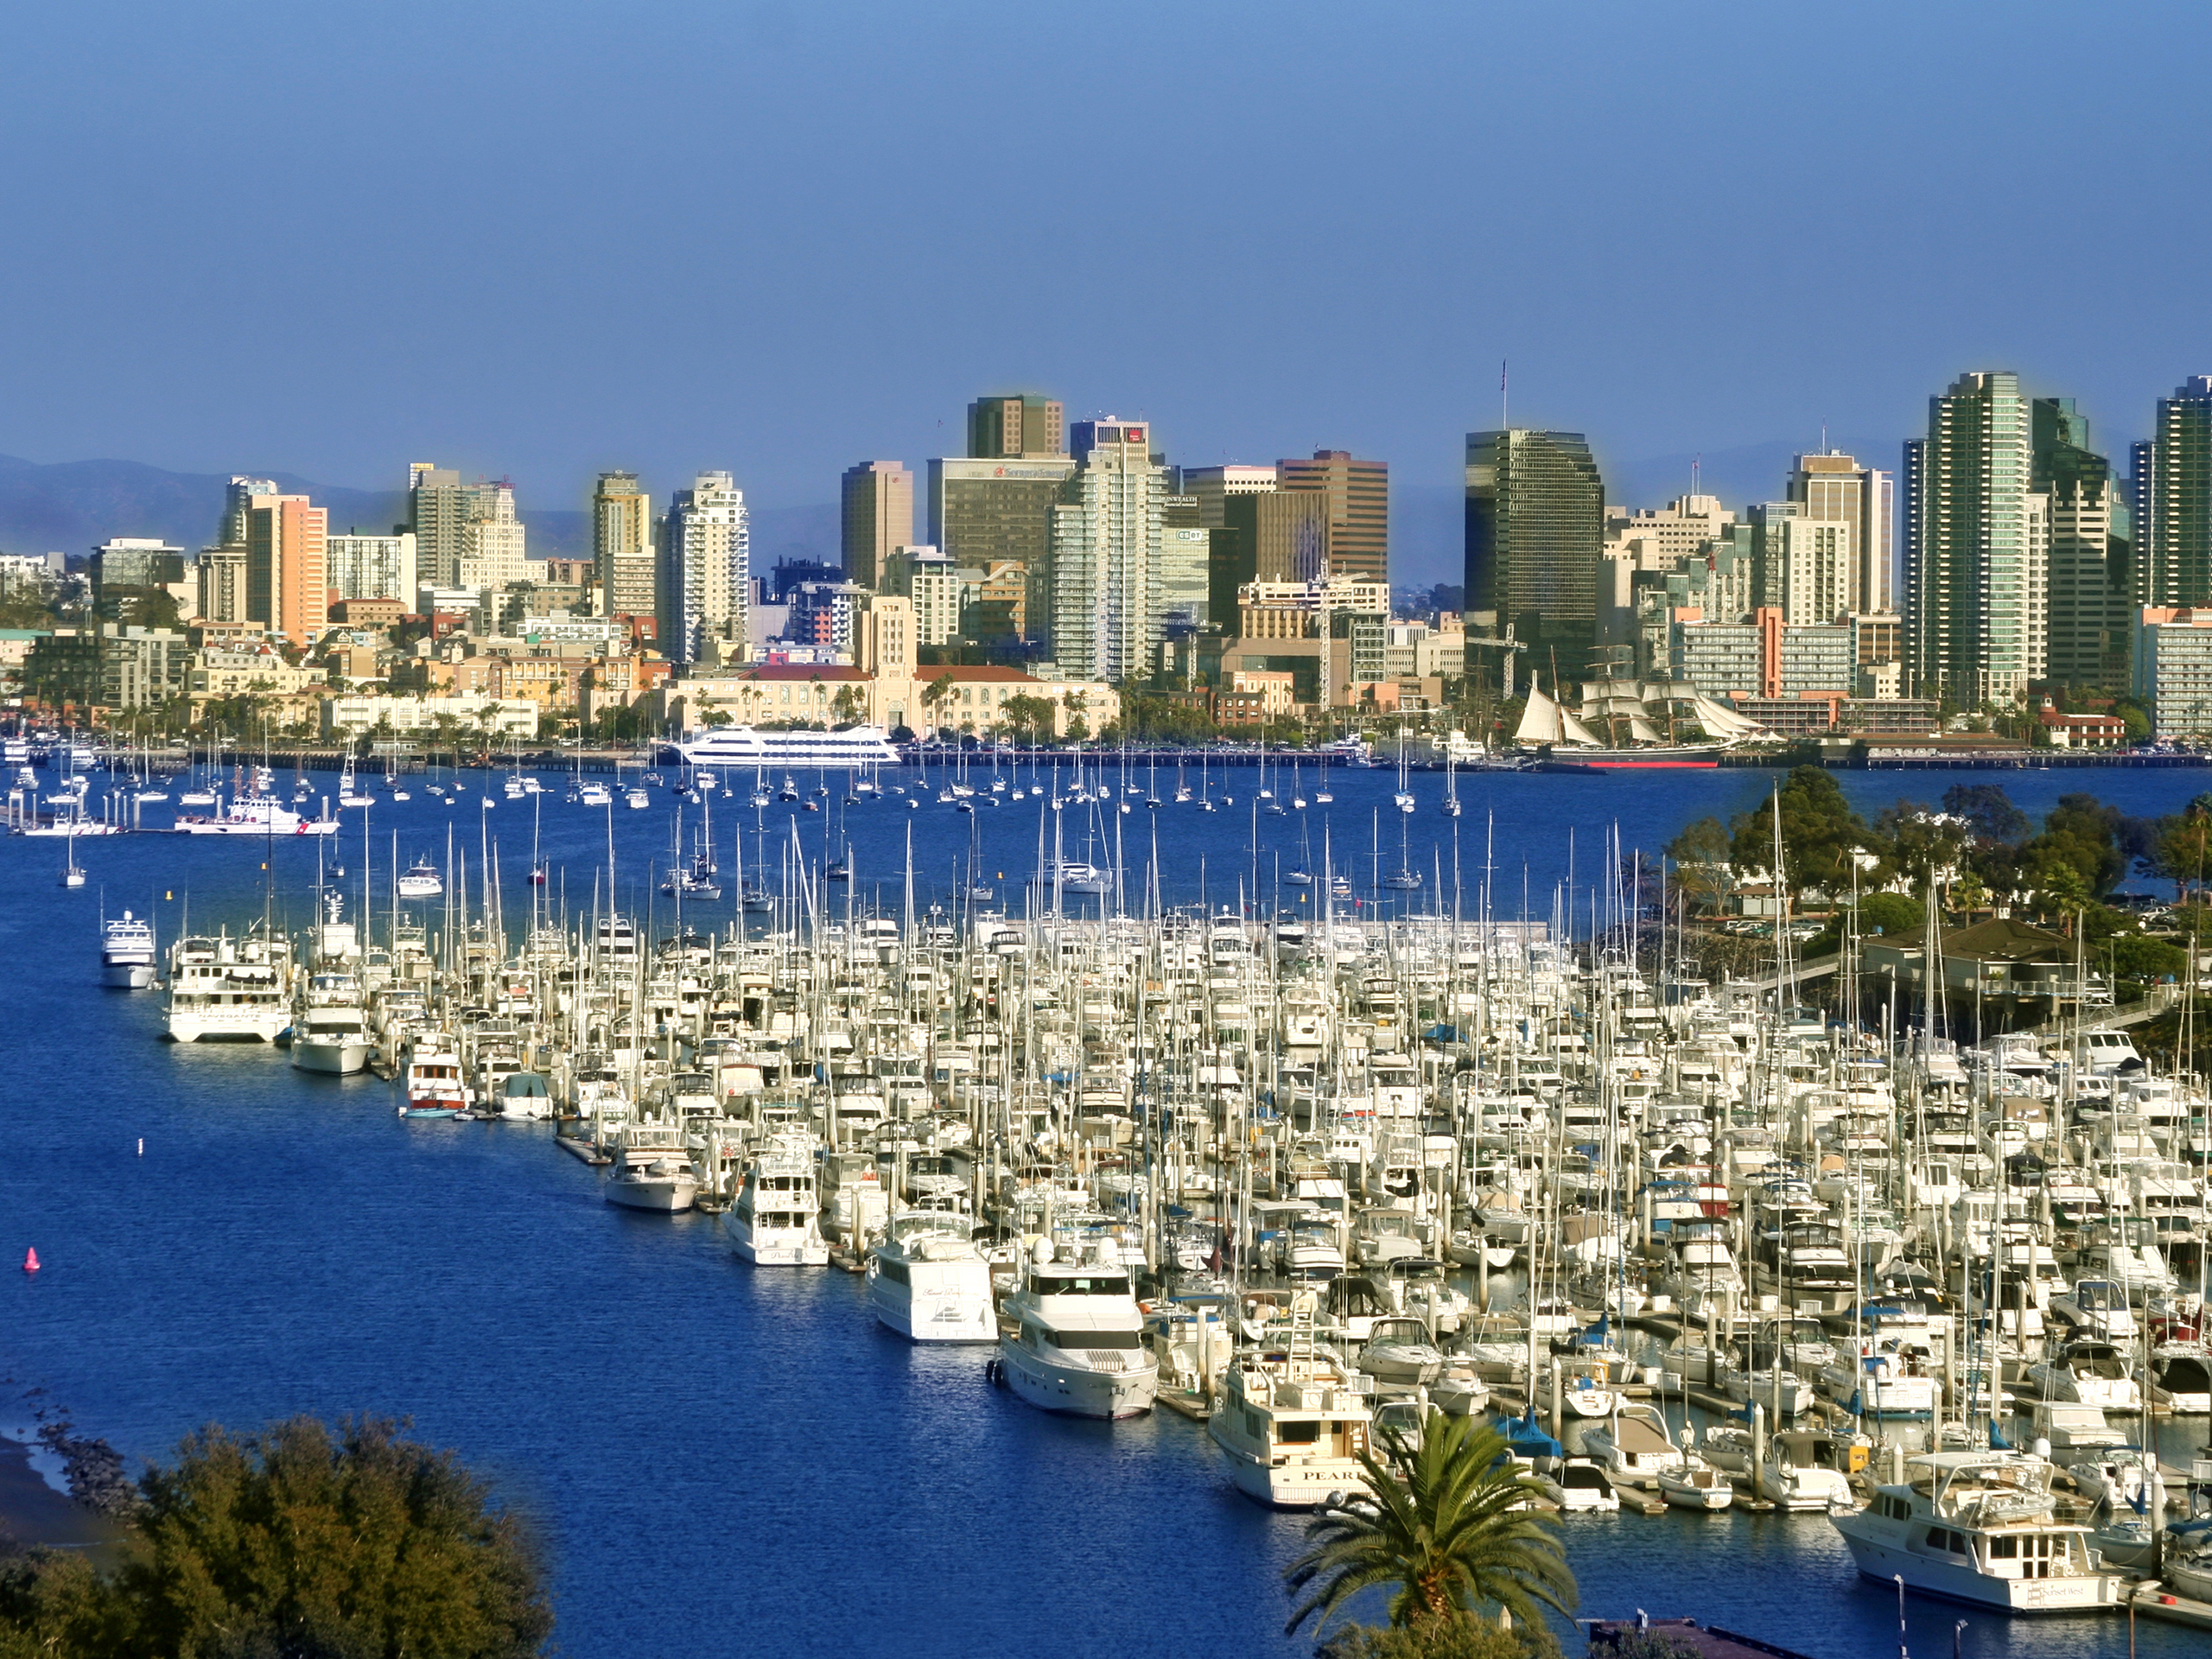 San Diego Vacation Rentals, Mission Beach House San diego historical photos